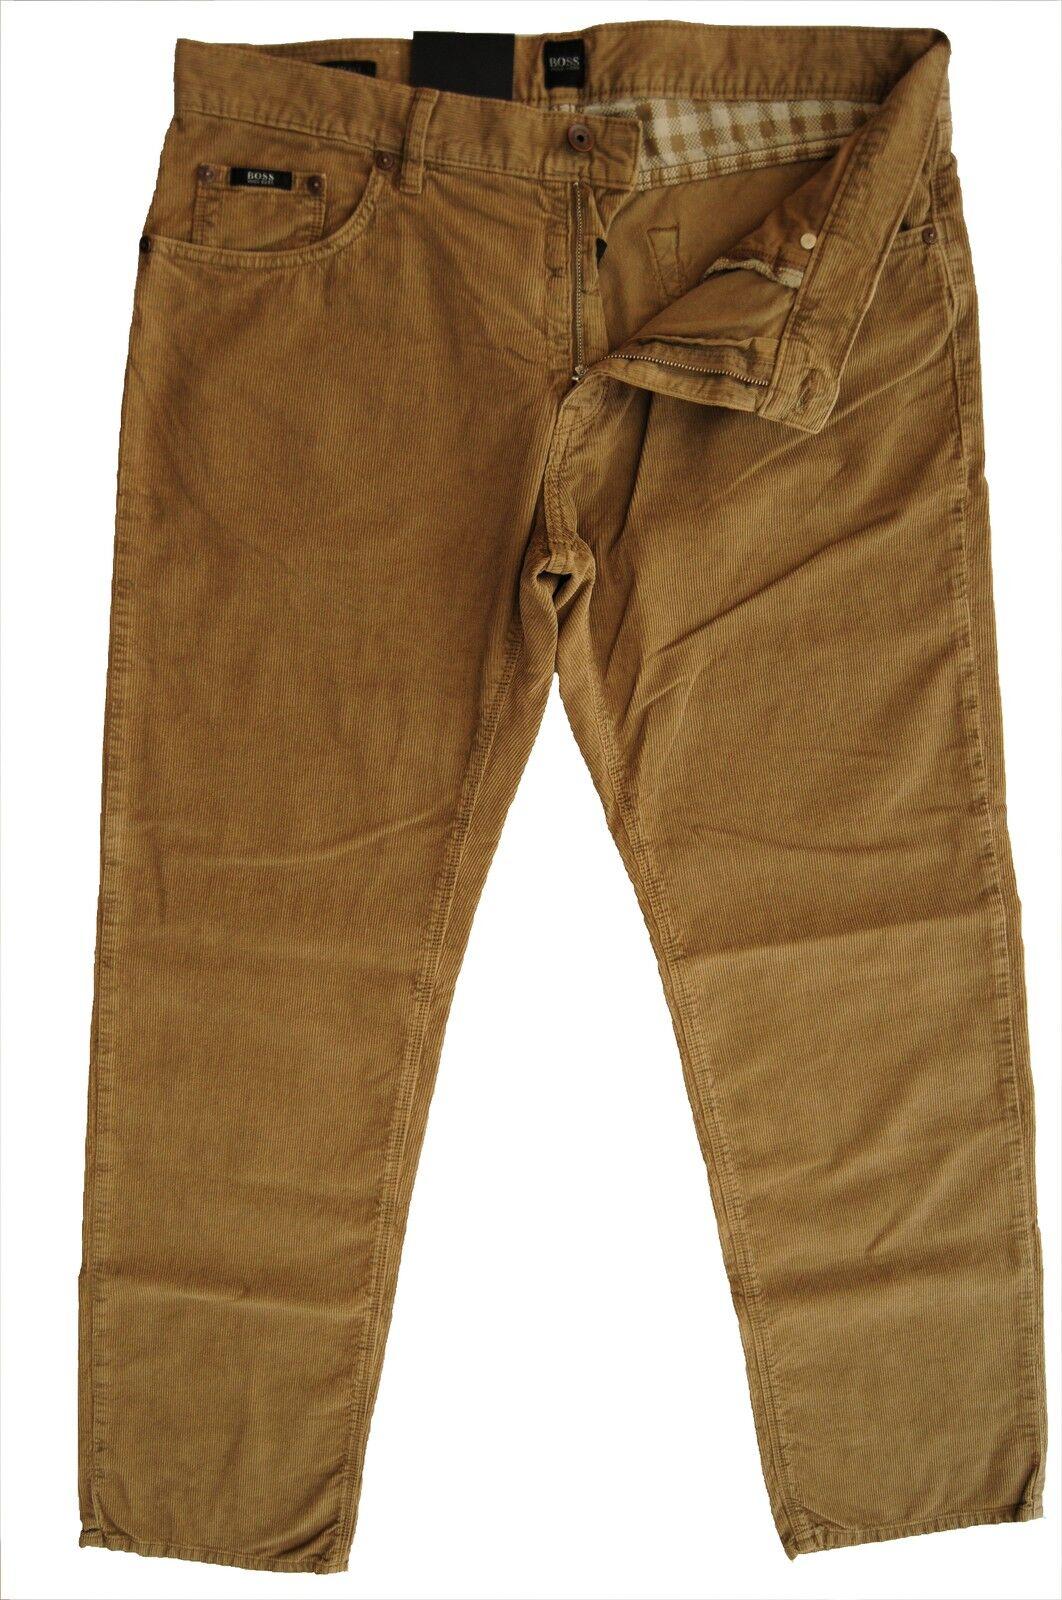 NUOVO w32 l34 Hugo Boss Jeans Pantaloni Maine 32 34 regular gamba fit 50207788